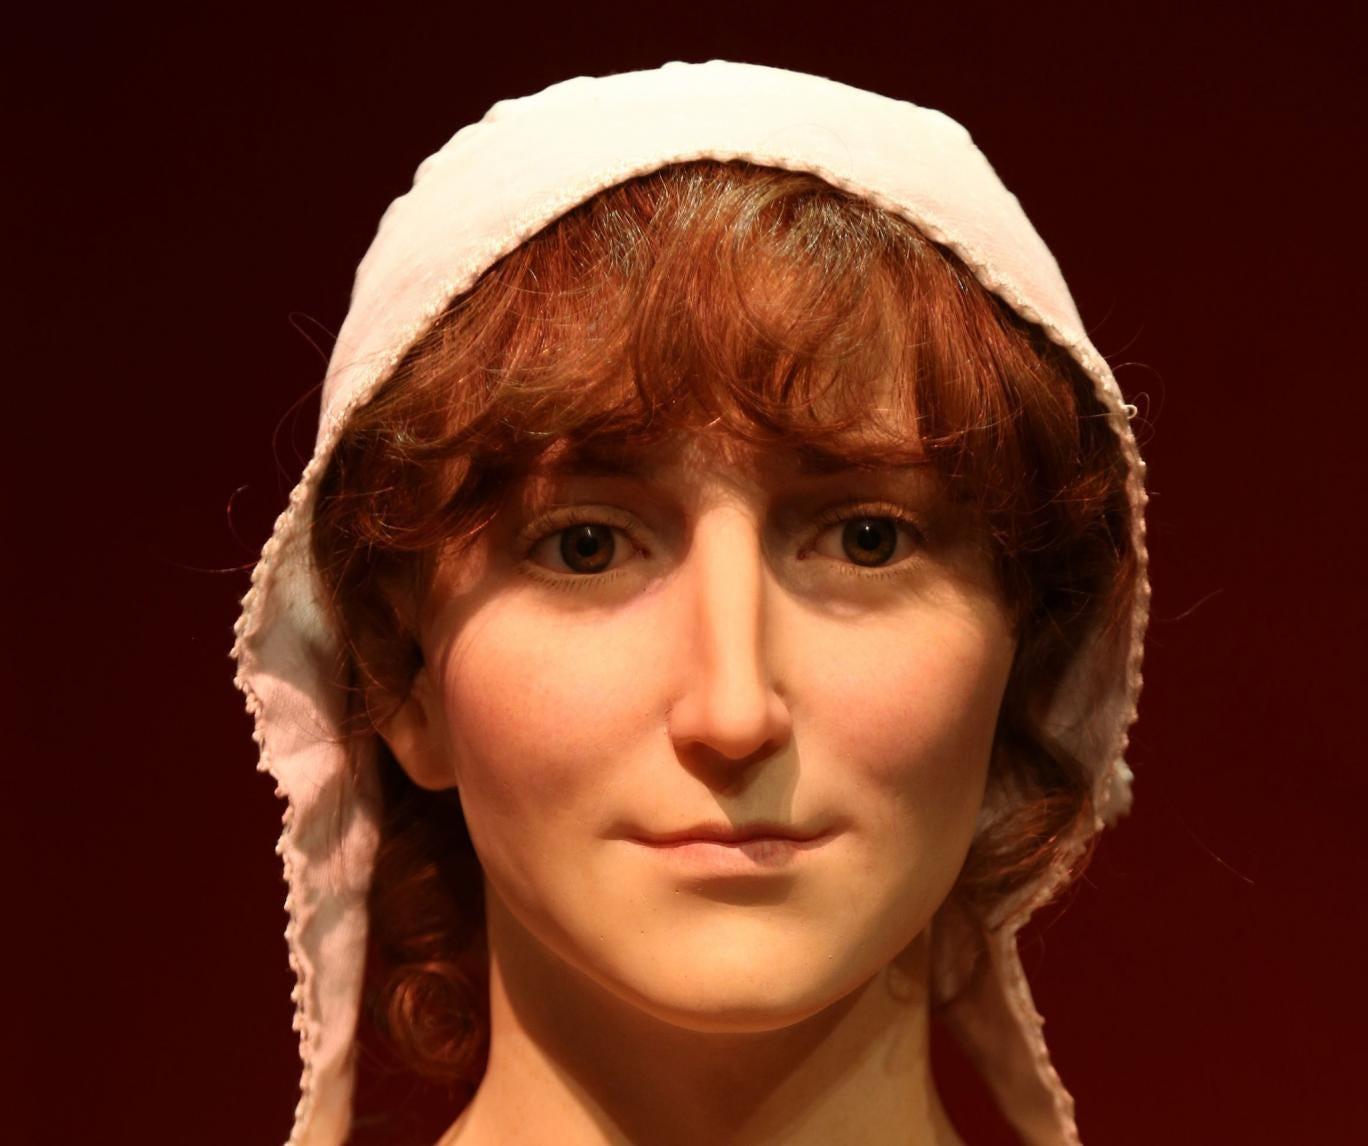 A waxwork of Jane Austen has been unveiled at The Jane Austen Centre in Bath